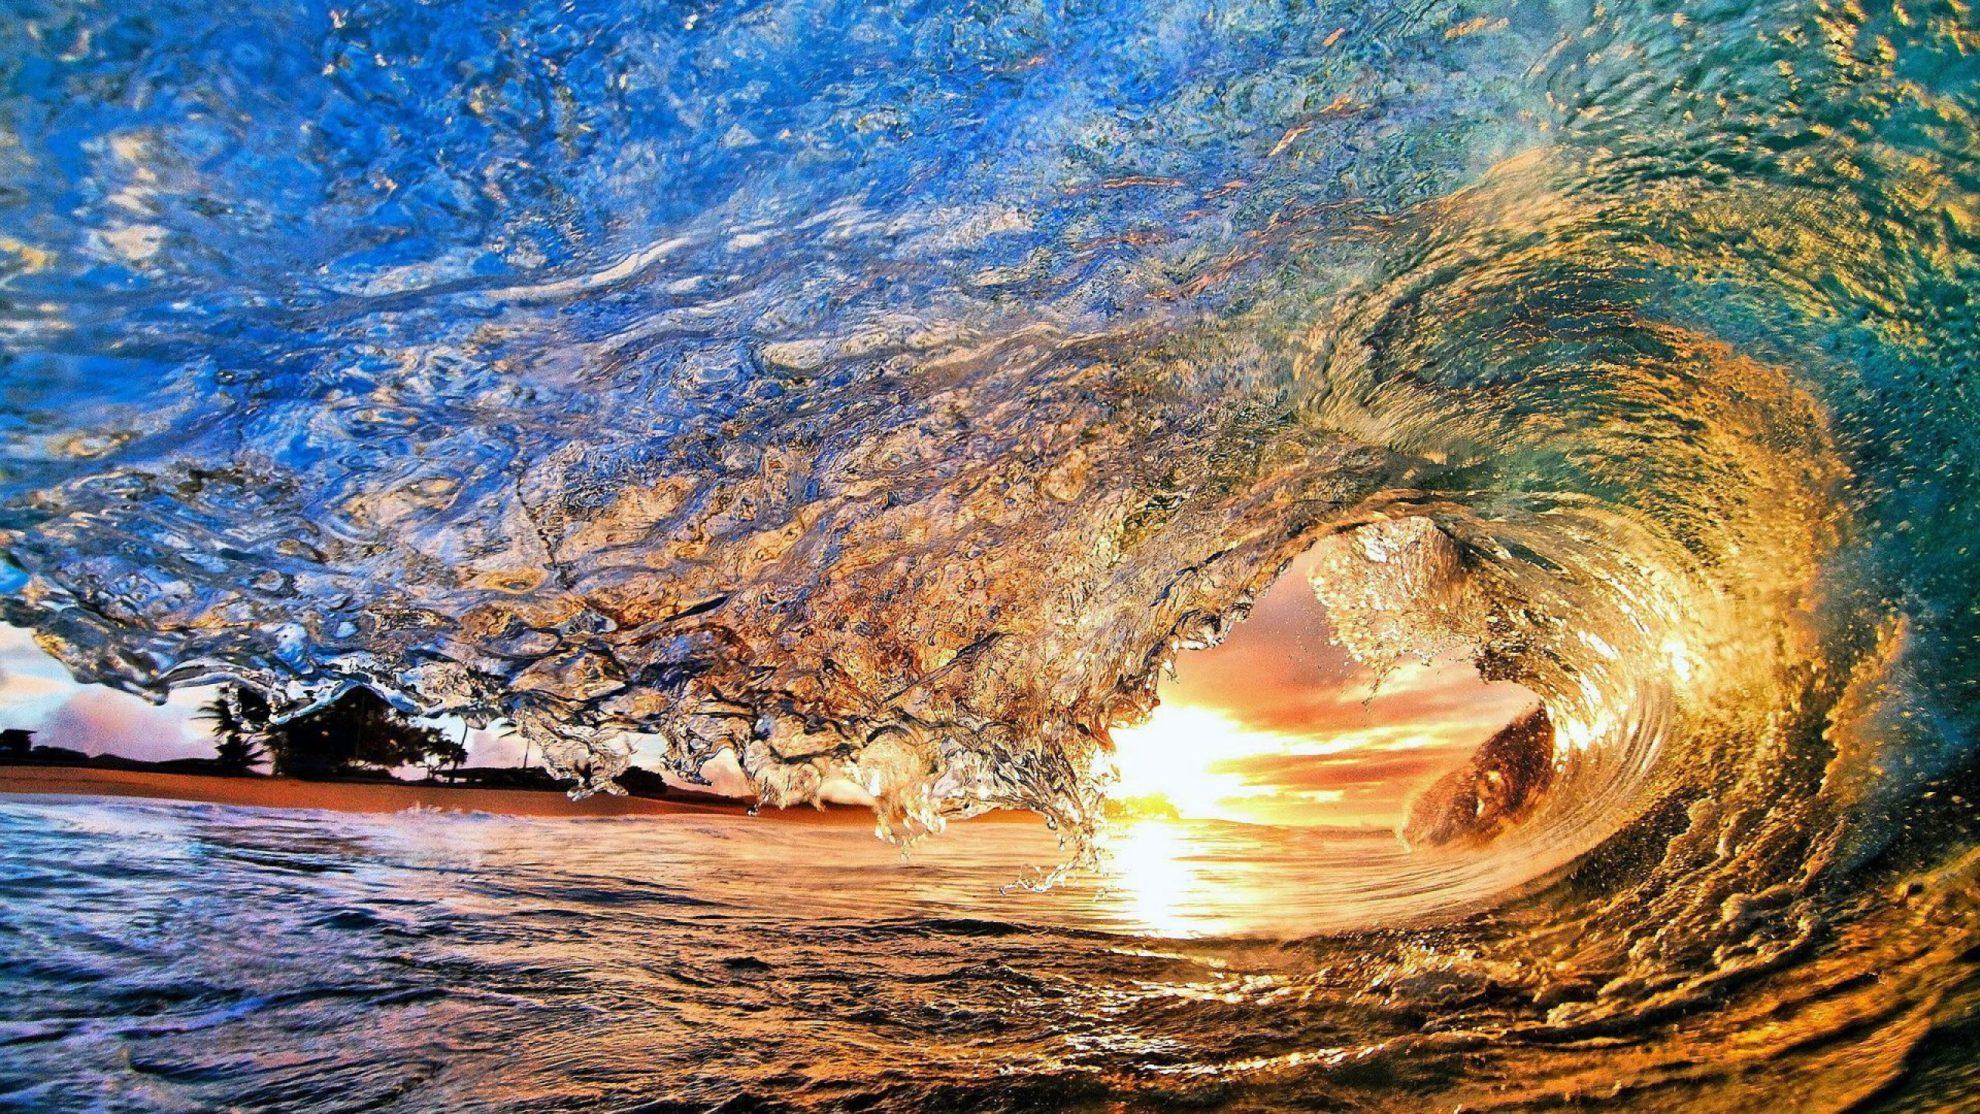 Ocean-Wave-Sunset-1440x2560